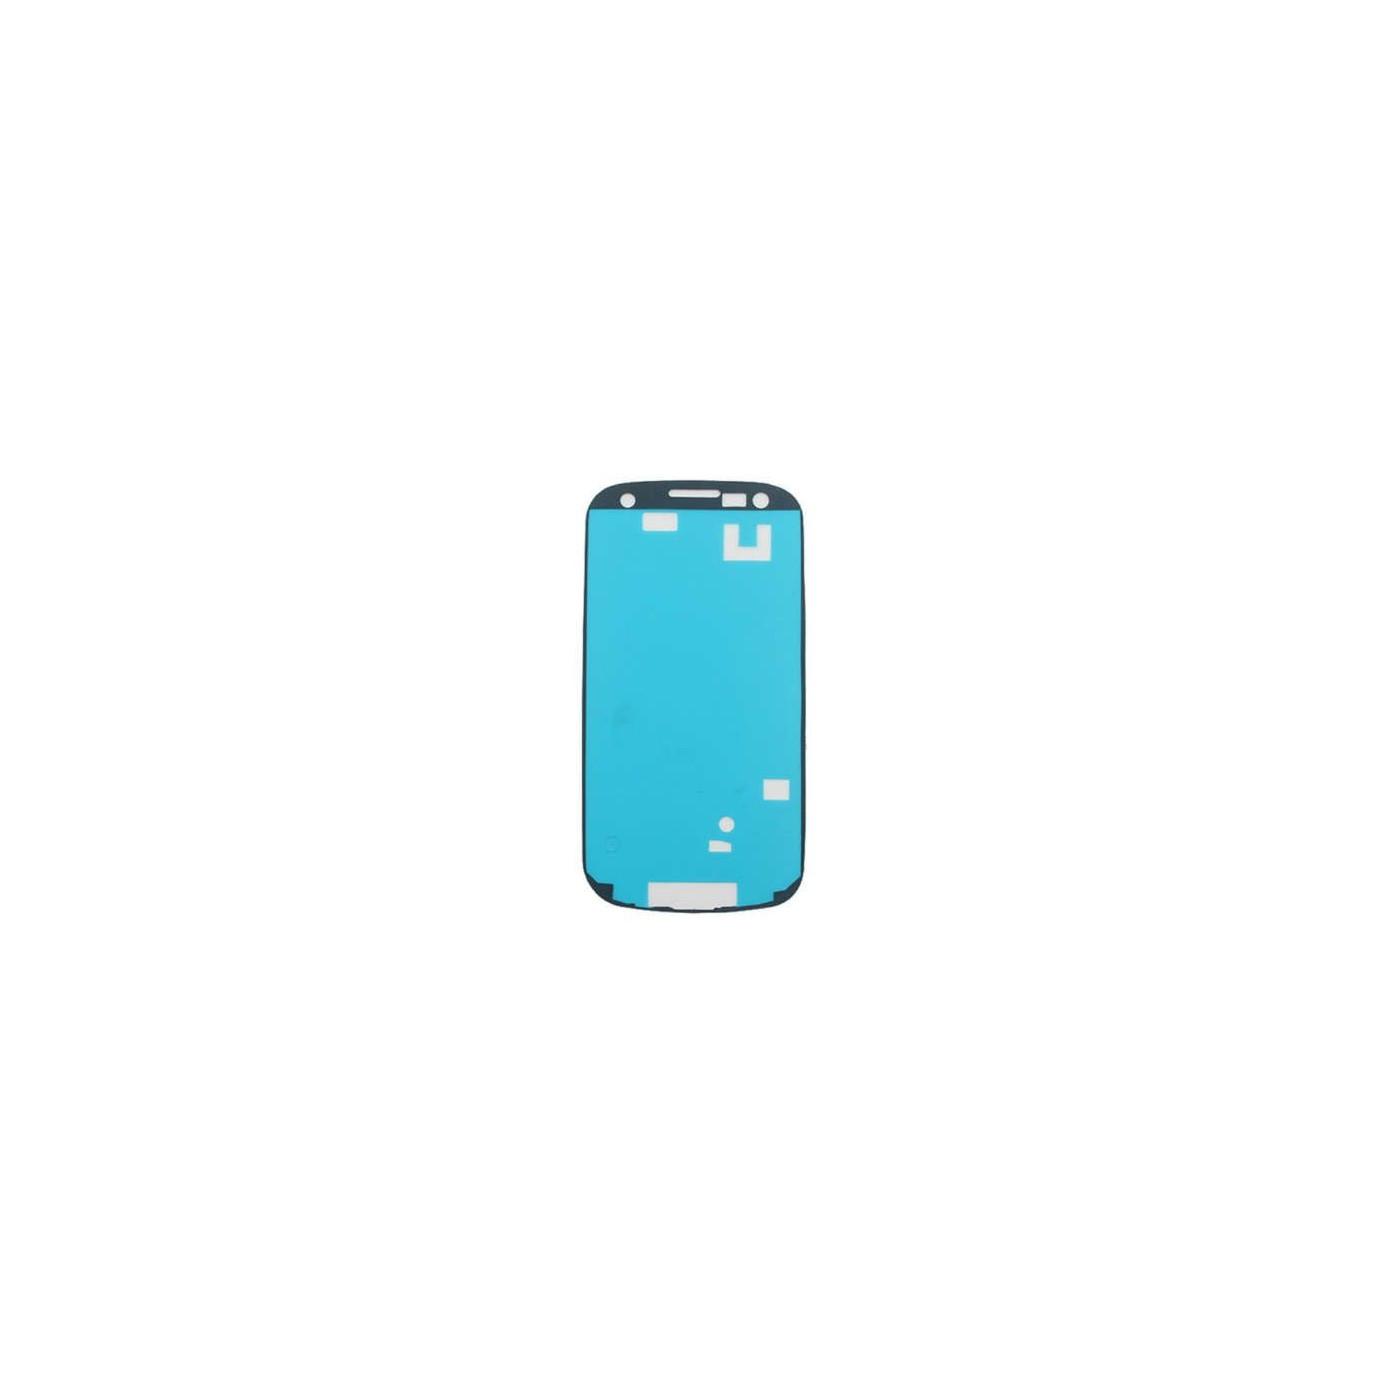 Doppelseitiges Glas für Samsung Galaxy S4 Mini i9195